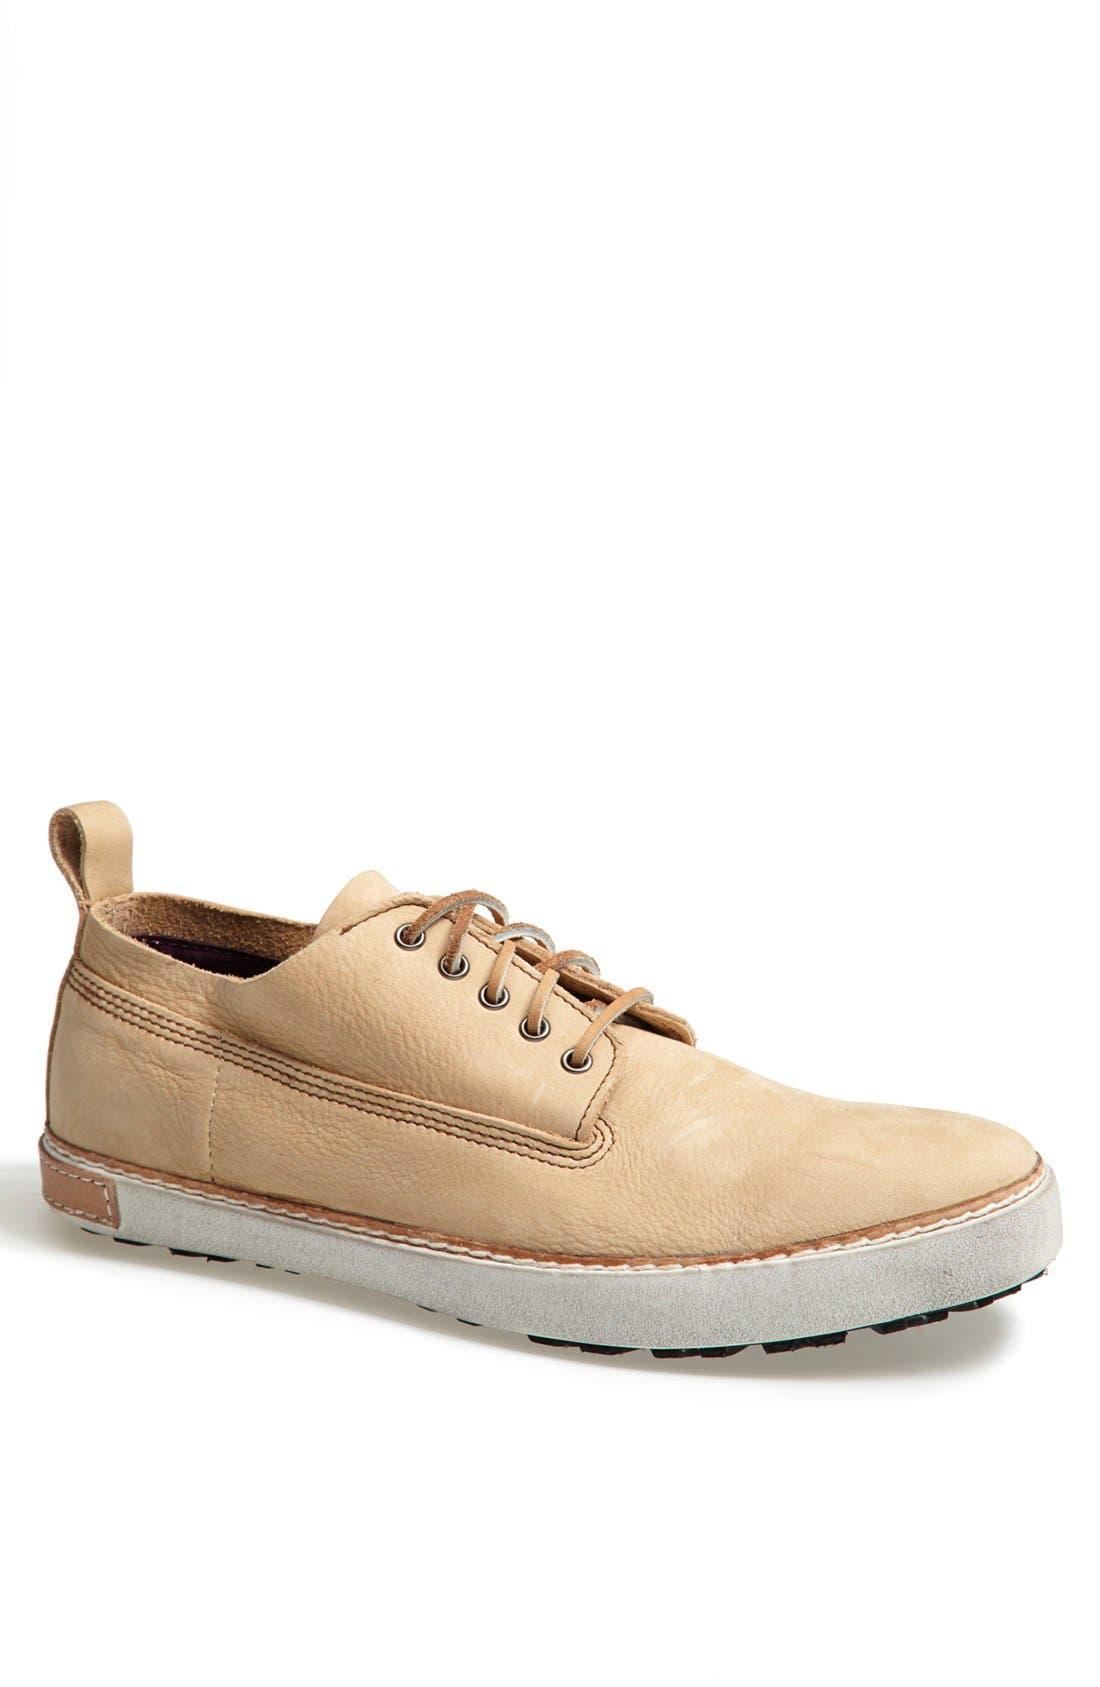 Main Image - Blackstone 'DM 10' Sneaker